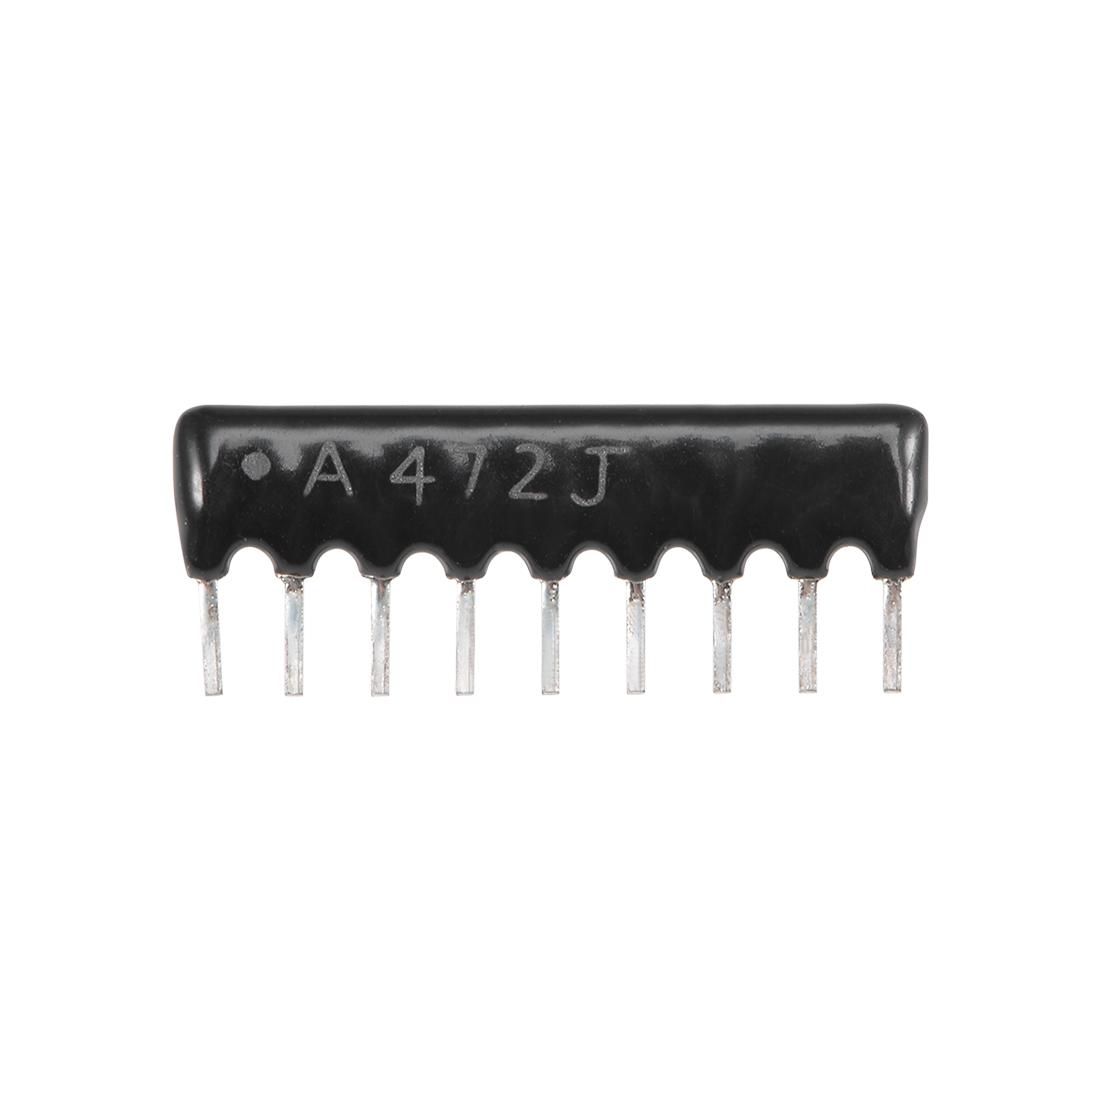 4.7K Ohm Resistor Network 1/8W SIP-9 Array 2.54mm Bussed Type 5% Tolerance 10pcs